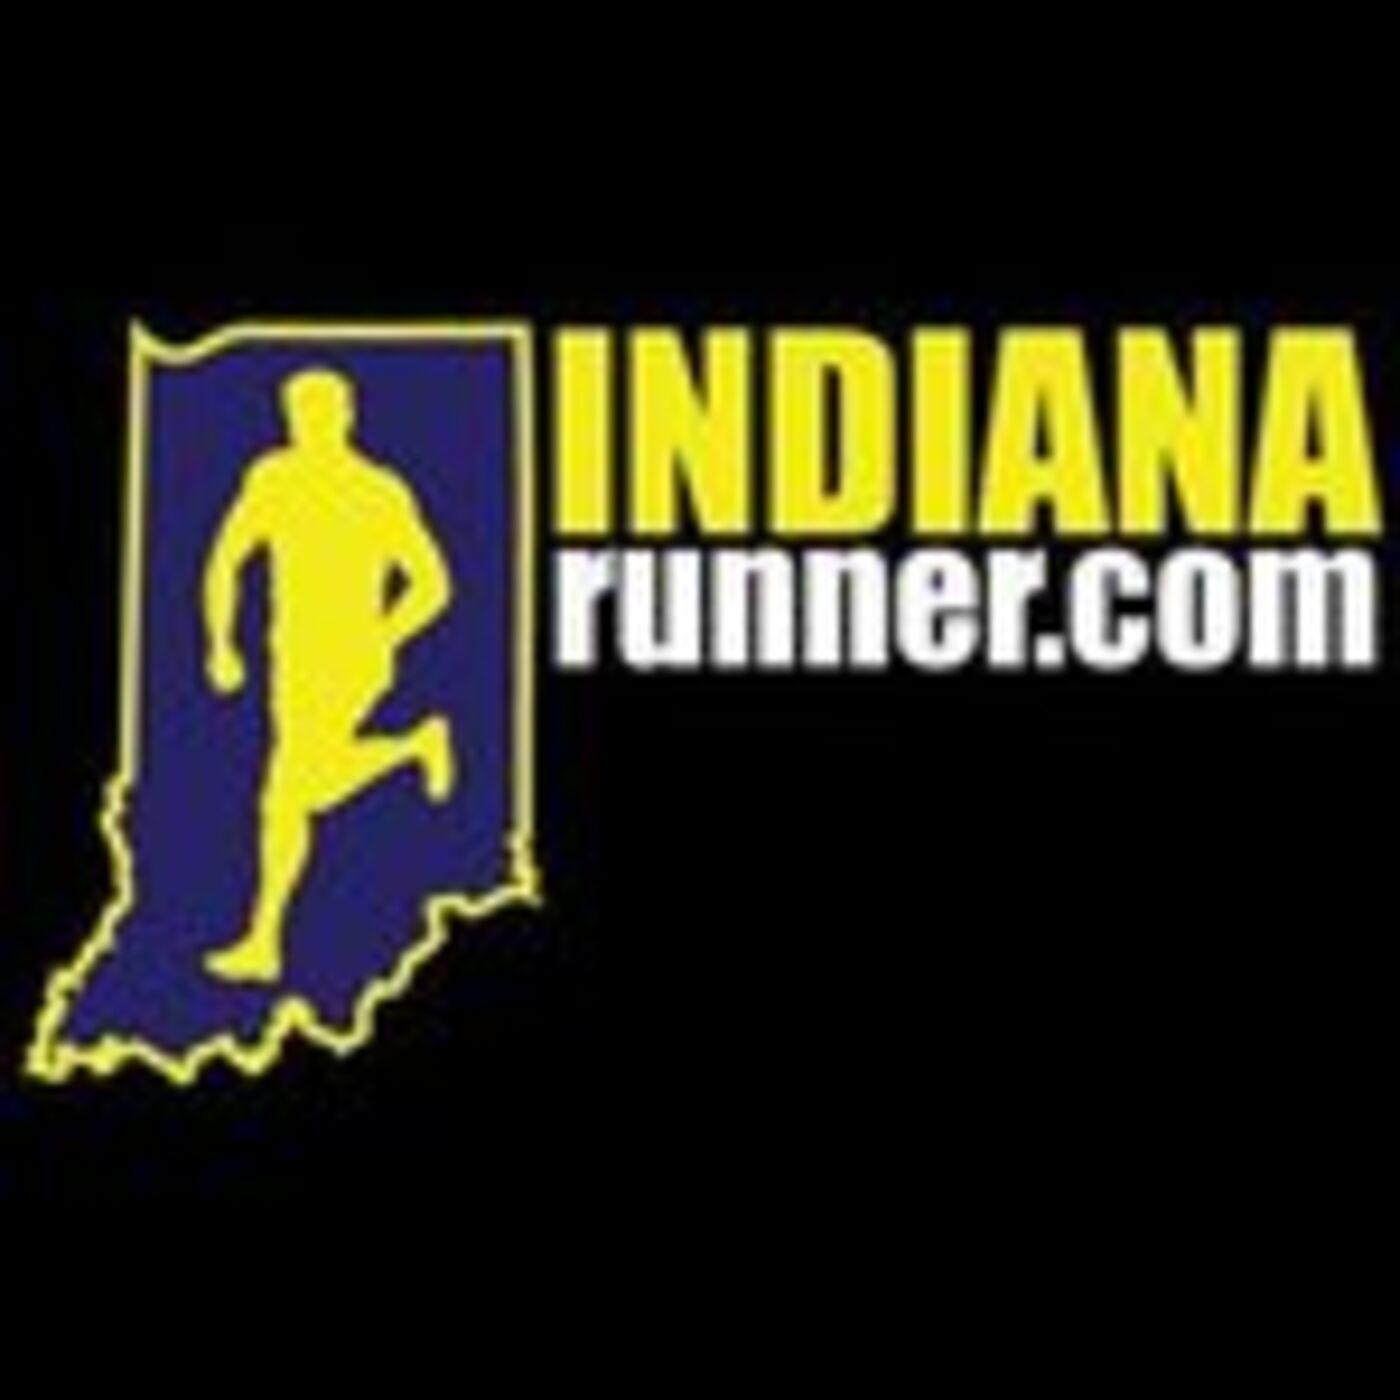 Indiana Runner Podcast